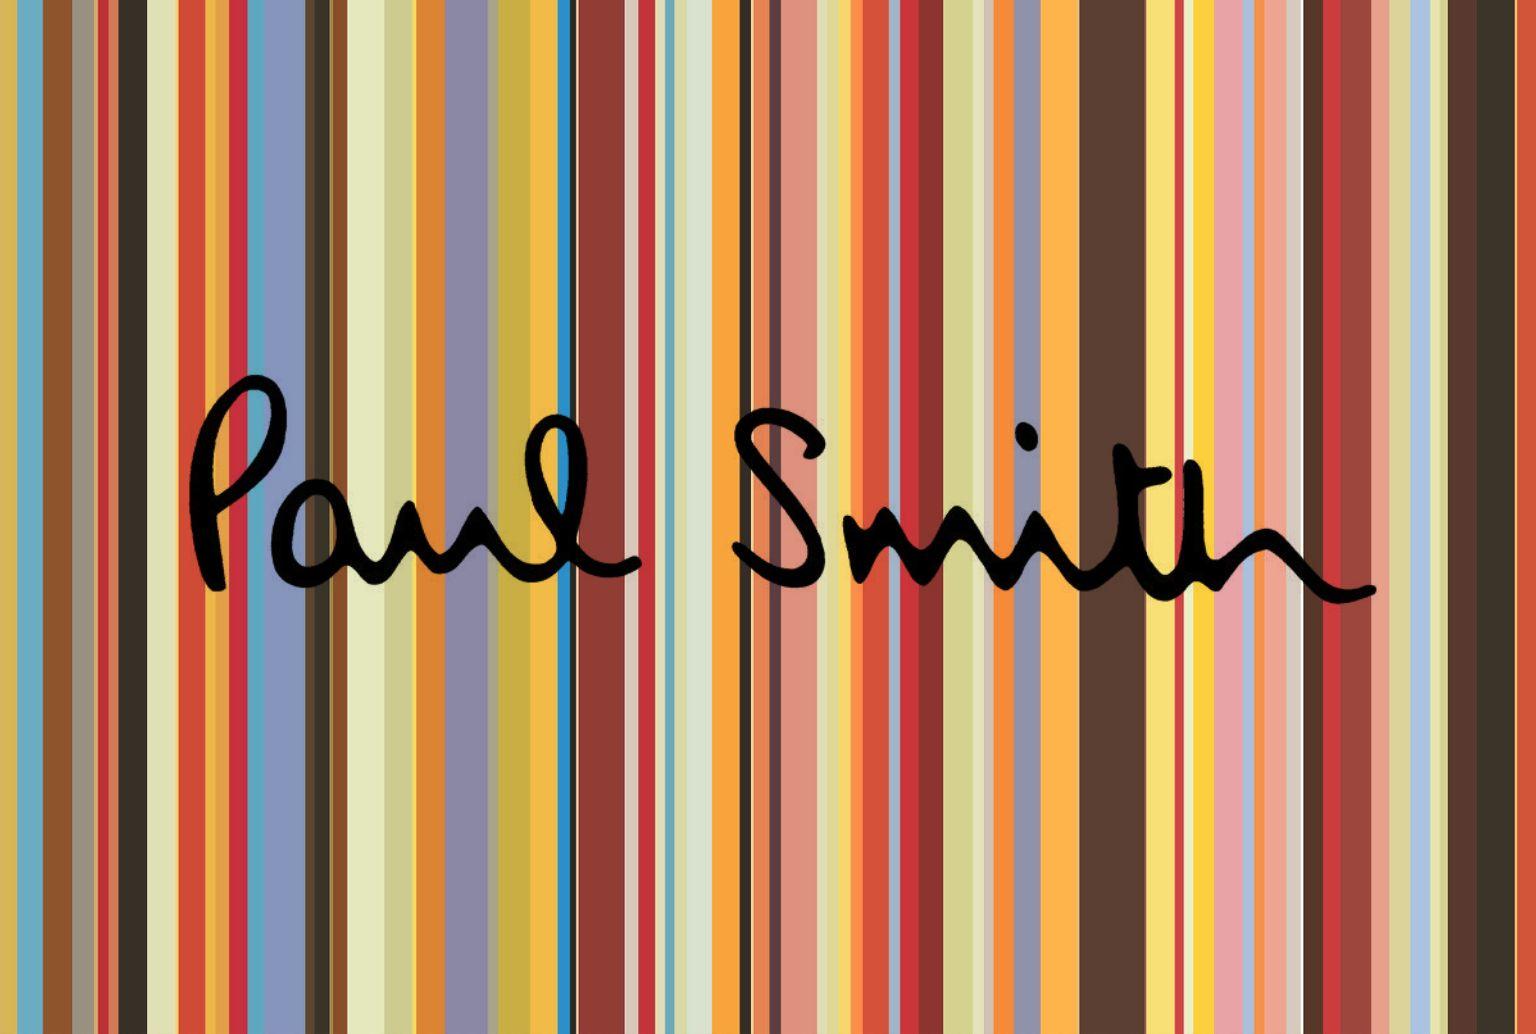 Iconic Stripes The History of Paul Smith  Blog  Childrensalon  Childrensalon